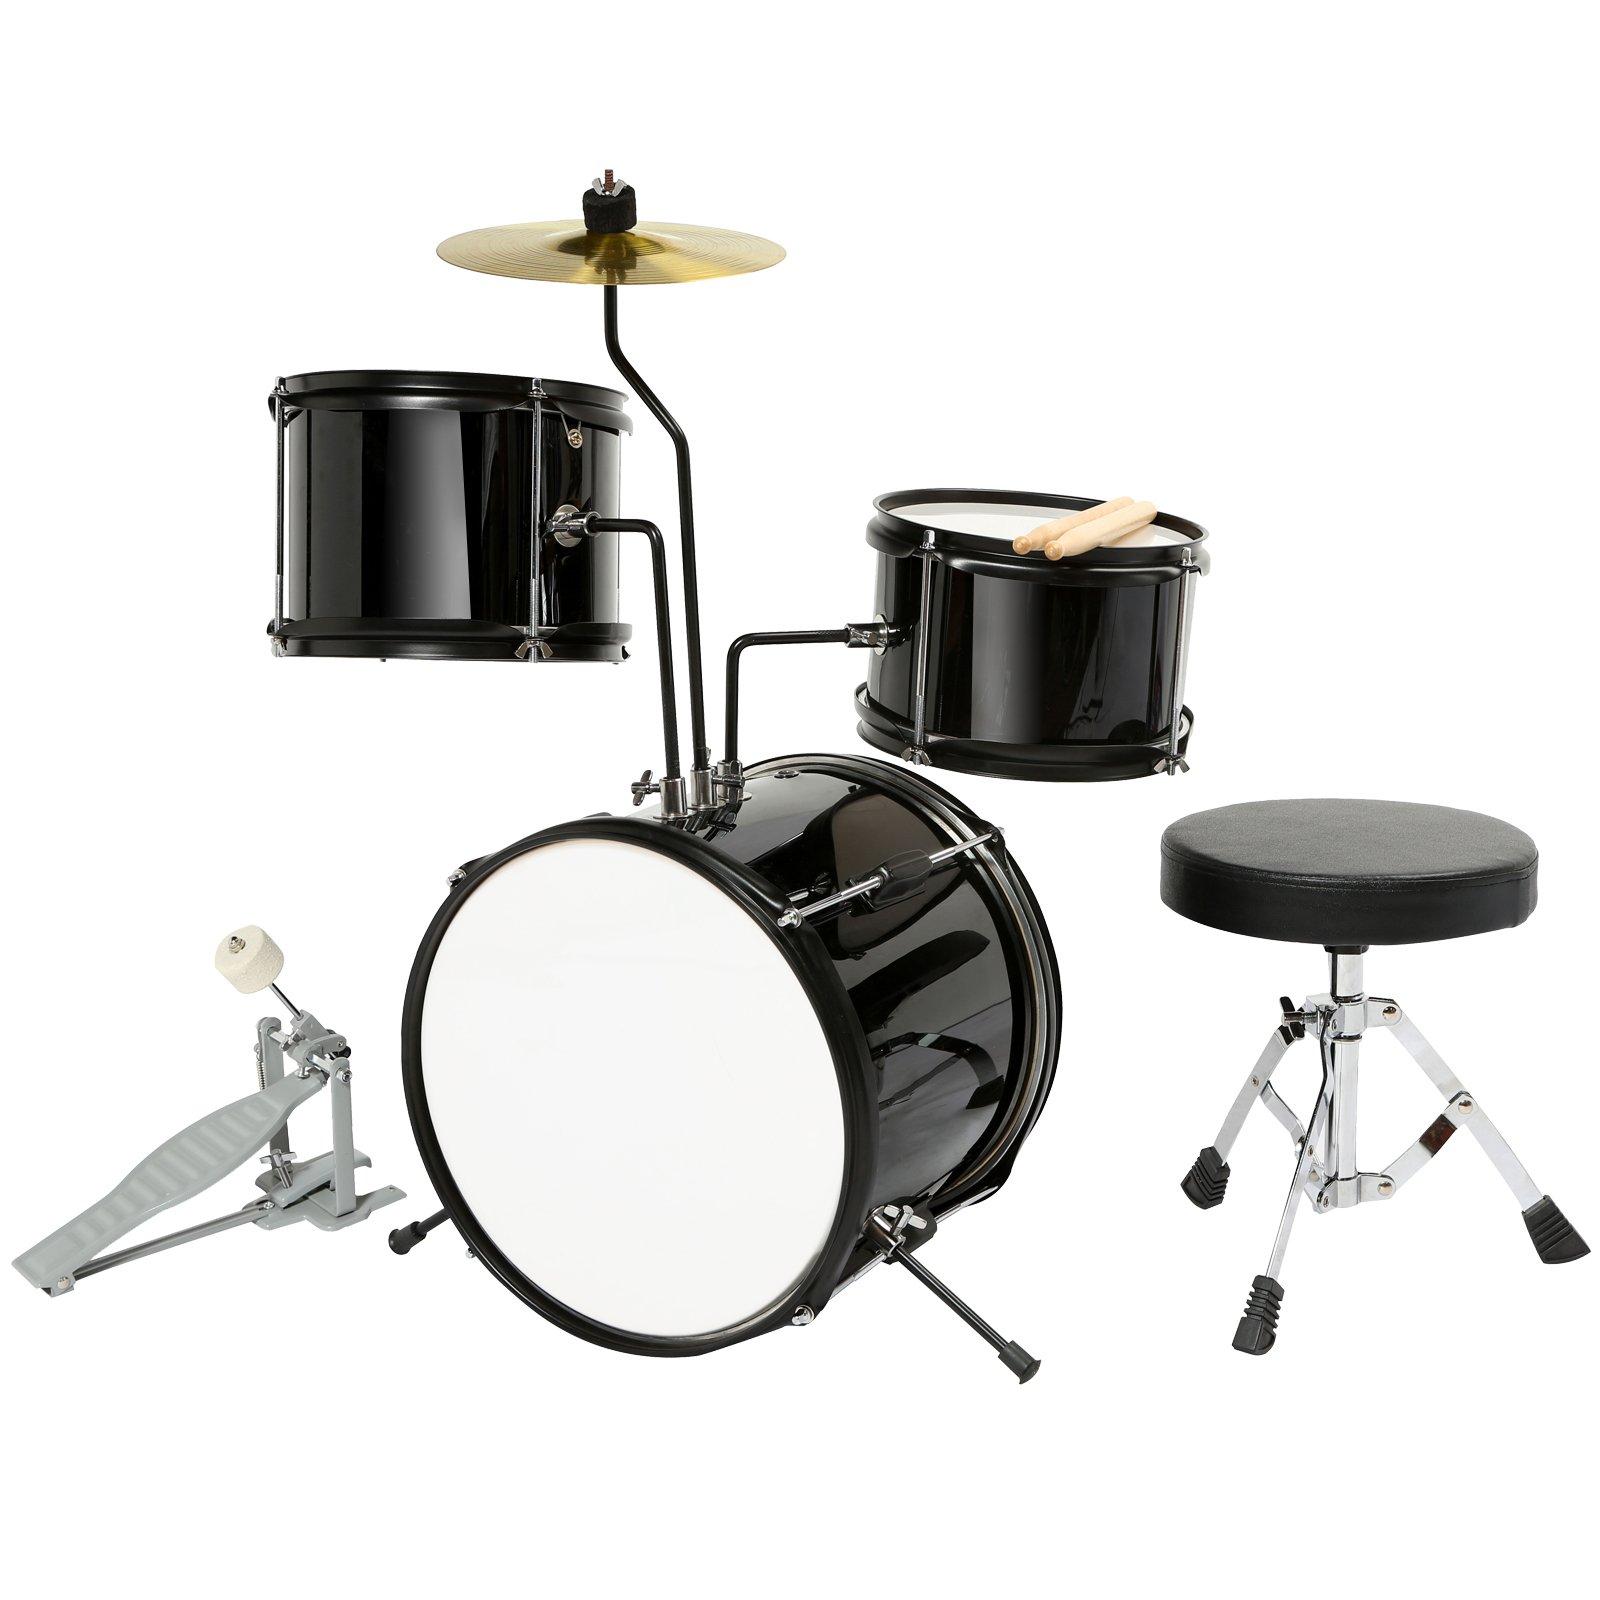 LAGRIMA Drum Set-12'' 3 Piece Complete Junior Drum Set Cymbals with Stand,Hi-Hat,Drum Stool,Drum Sticks for Girl Boy Kids (3-8 Years Old), Black